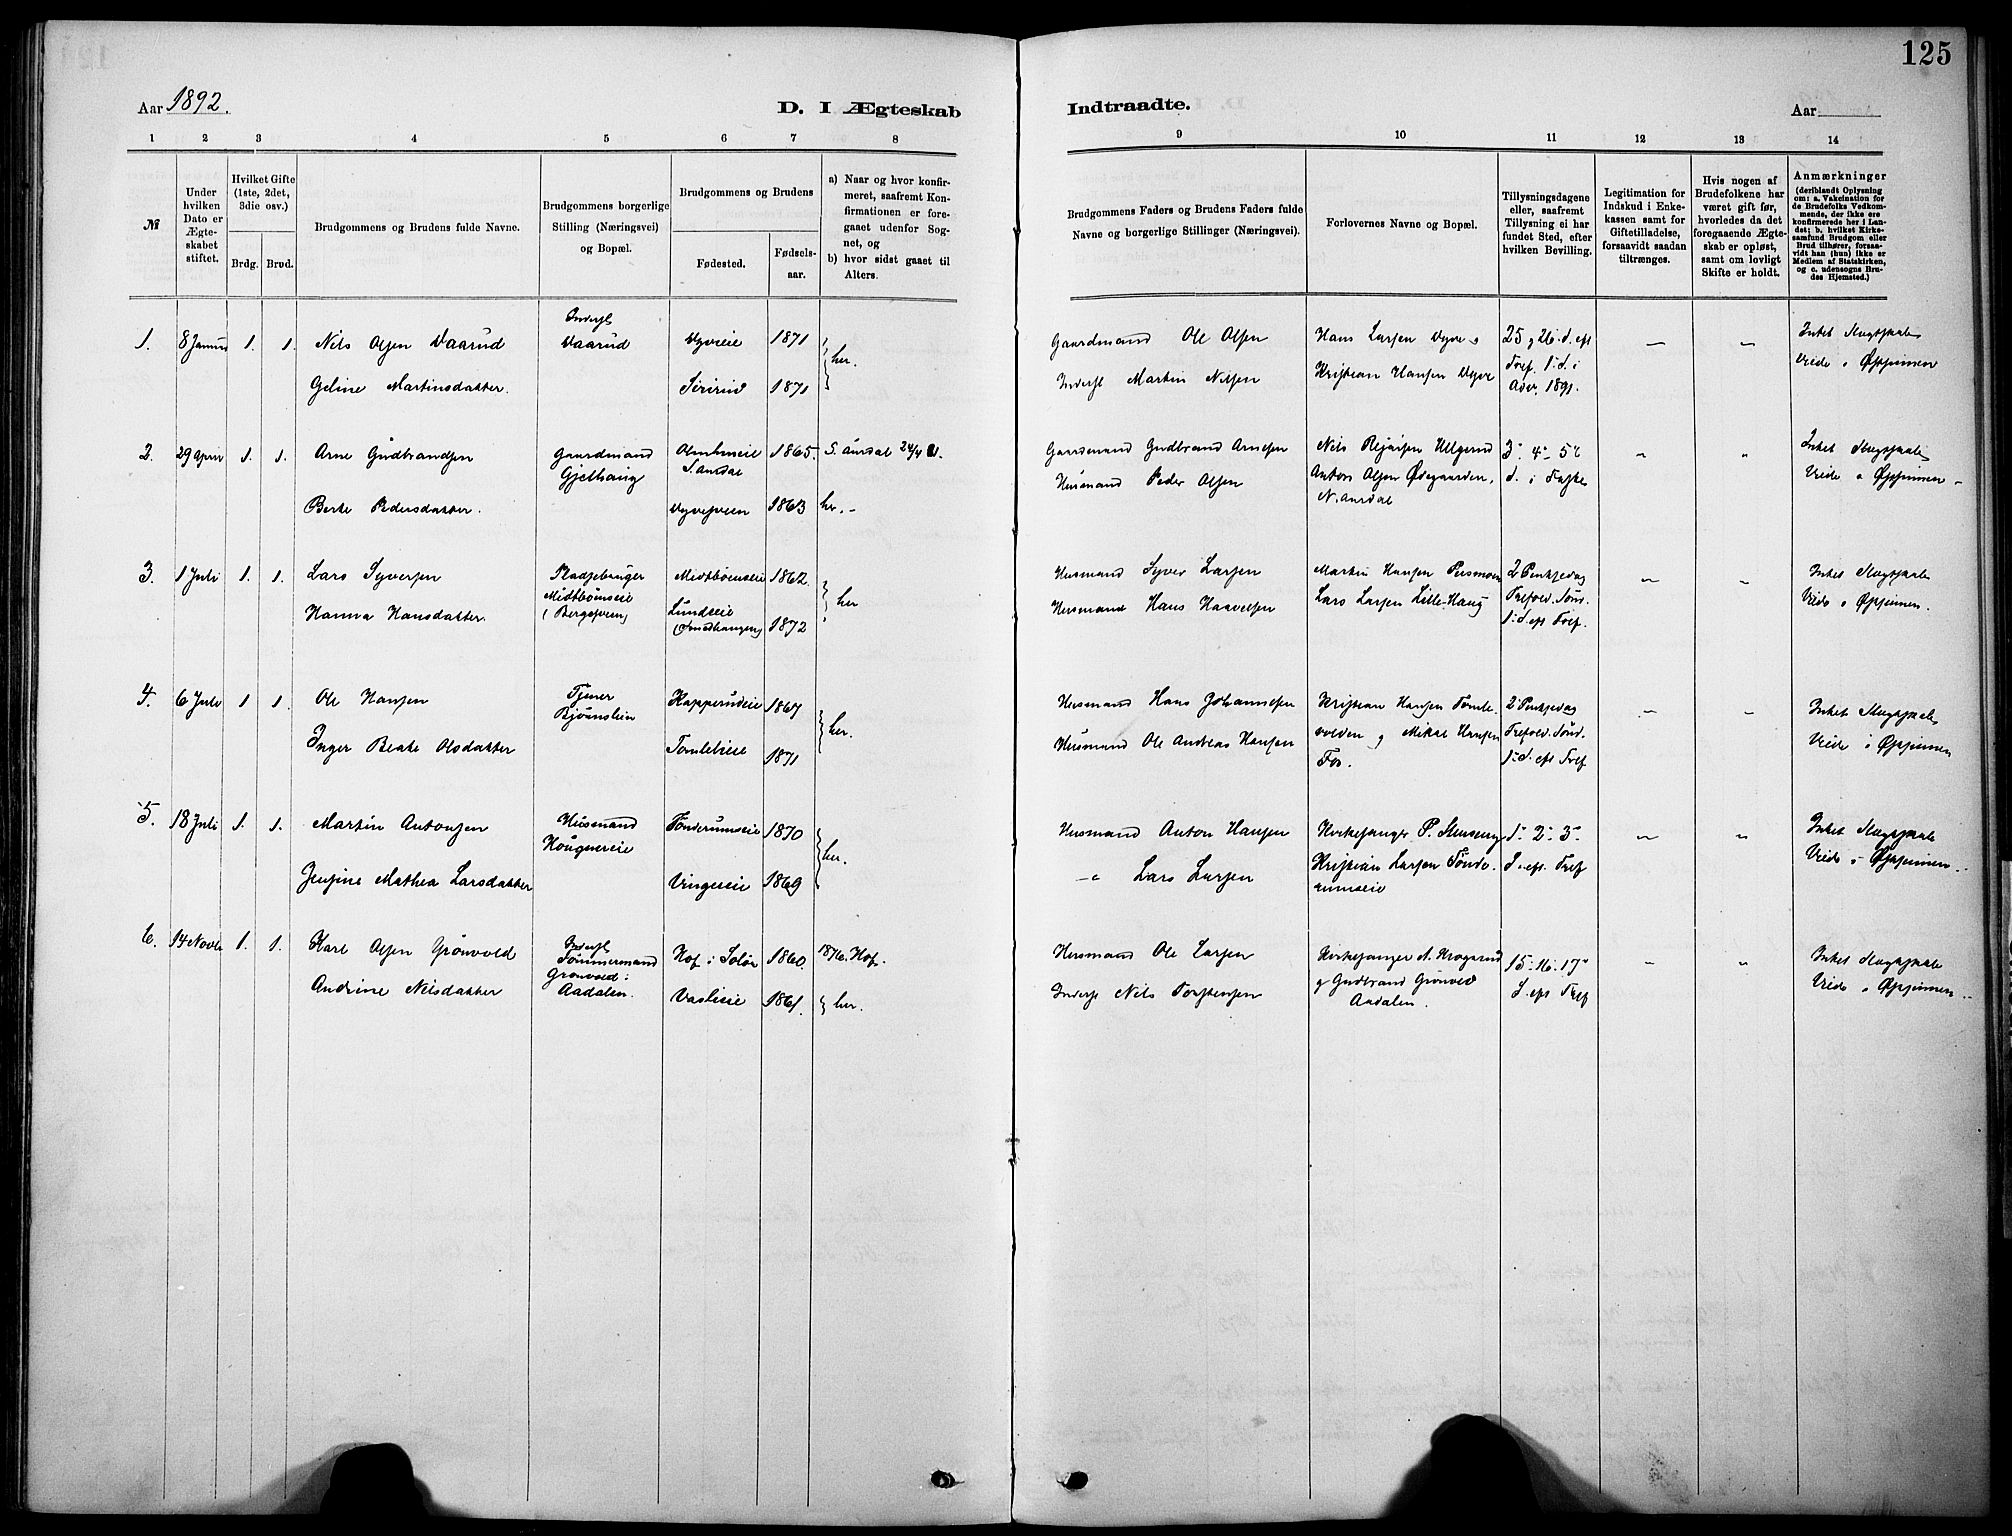 SAH, Nordre Land prestekontor, Ministerialbok nr. 5, 1882-1903, s. 125